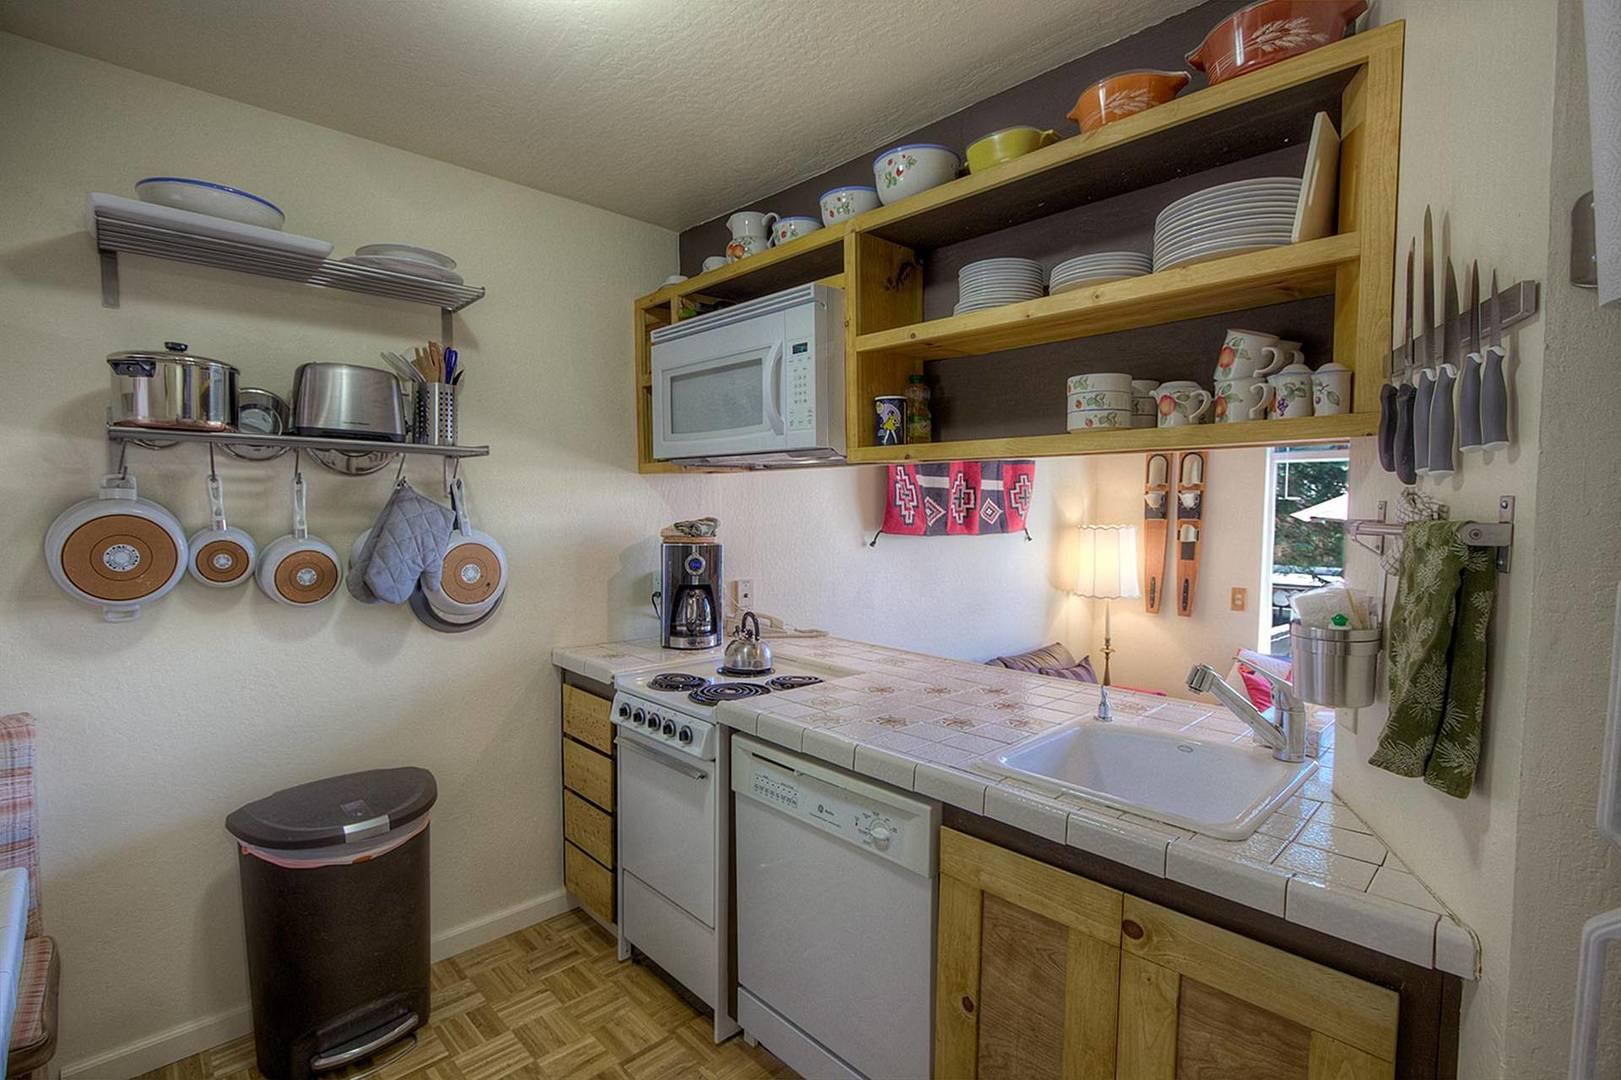 tcc0663 kitchen